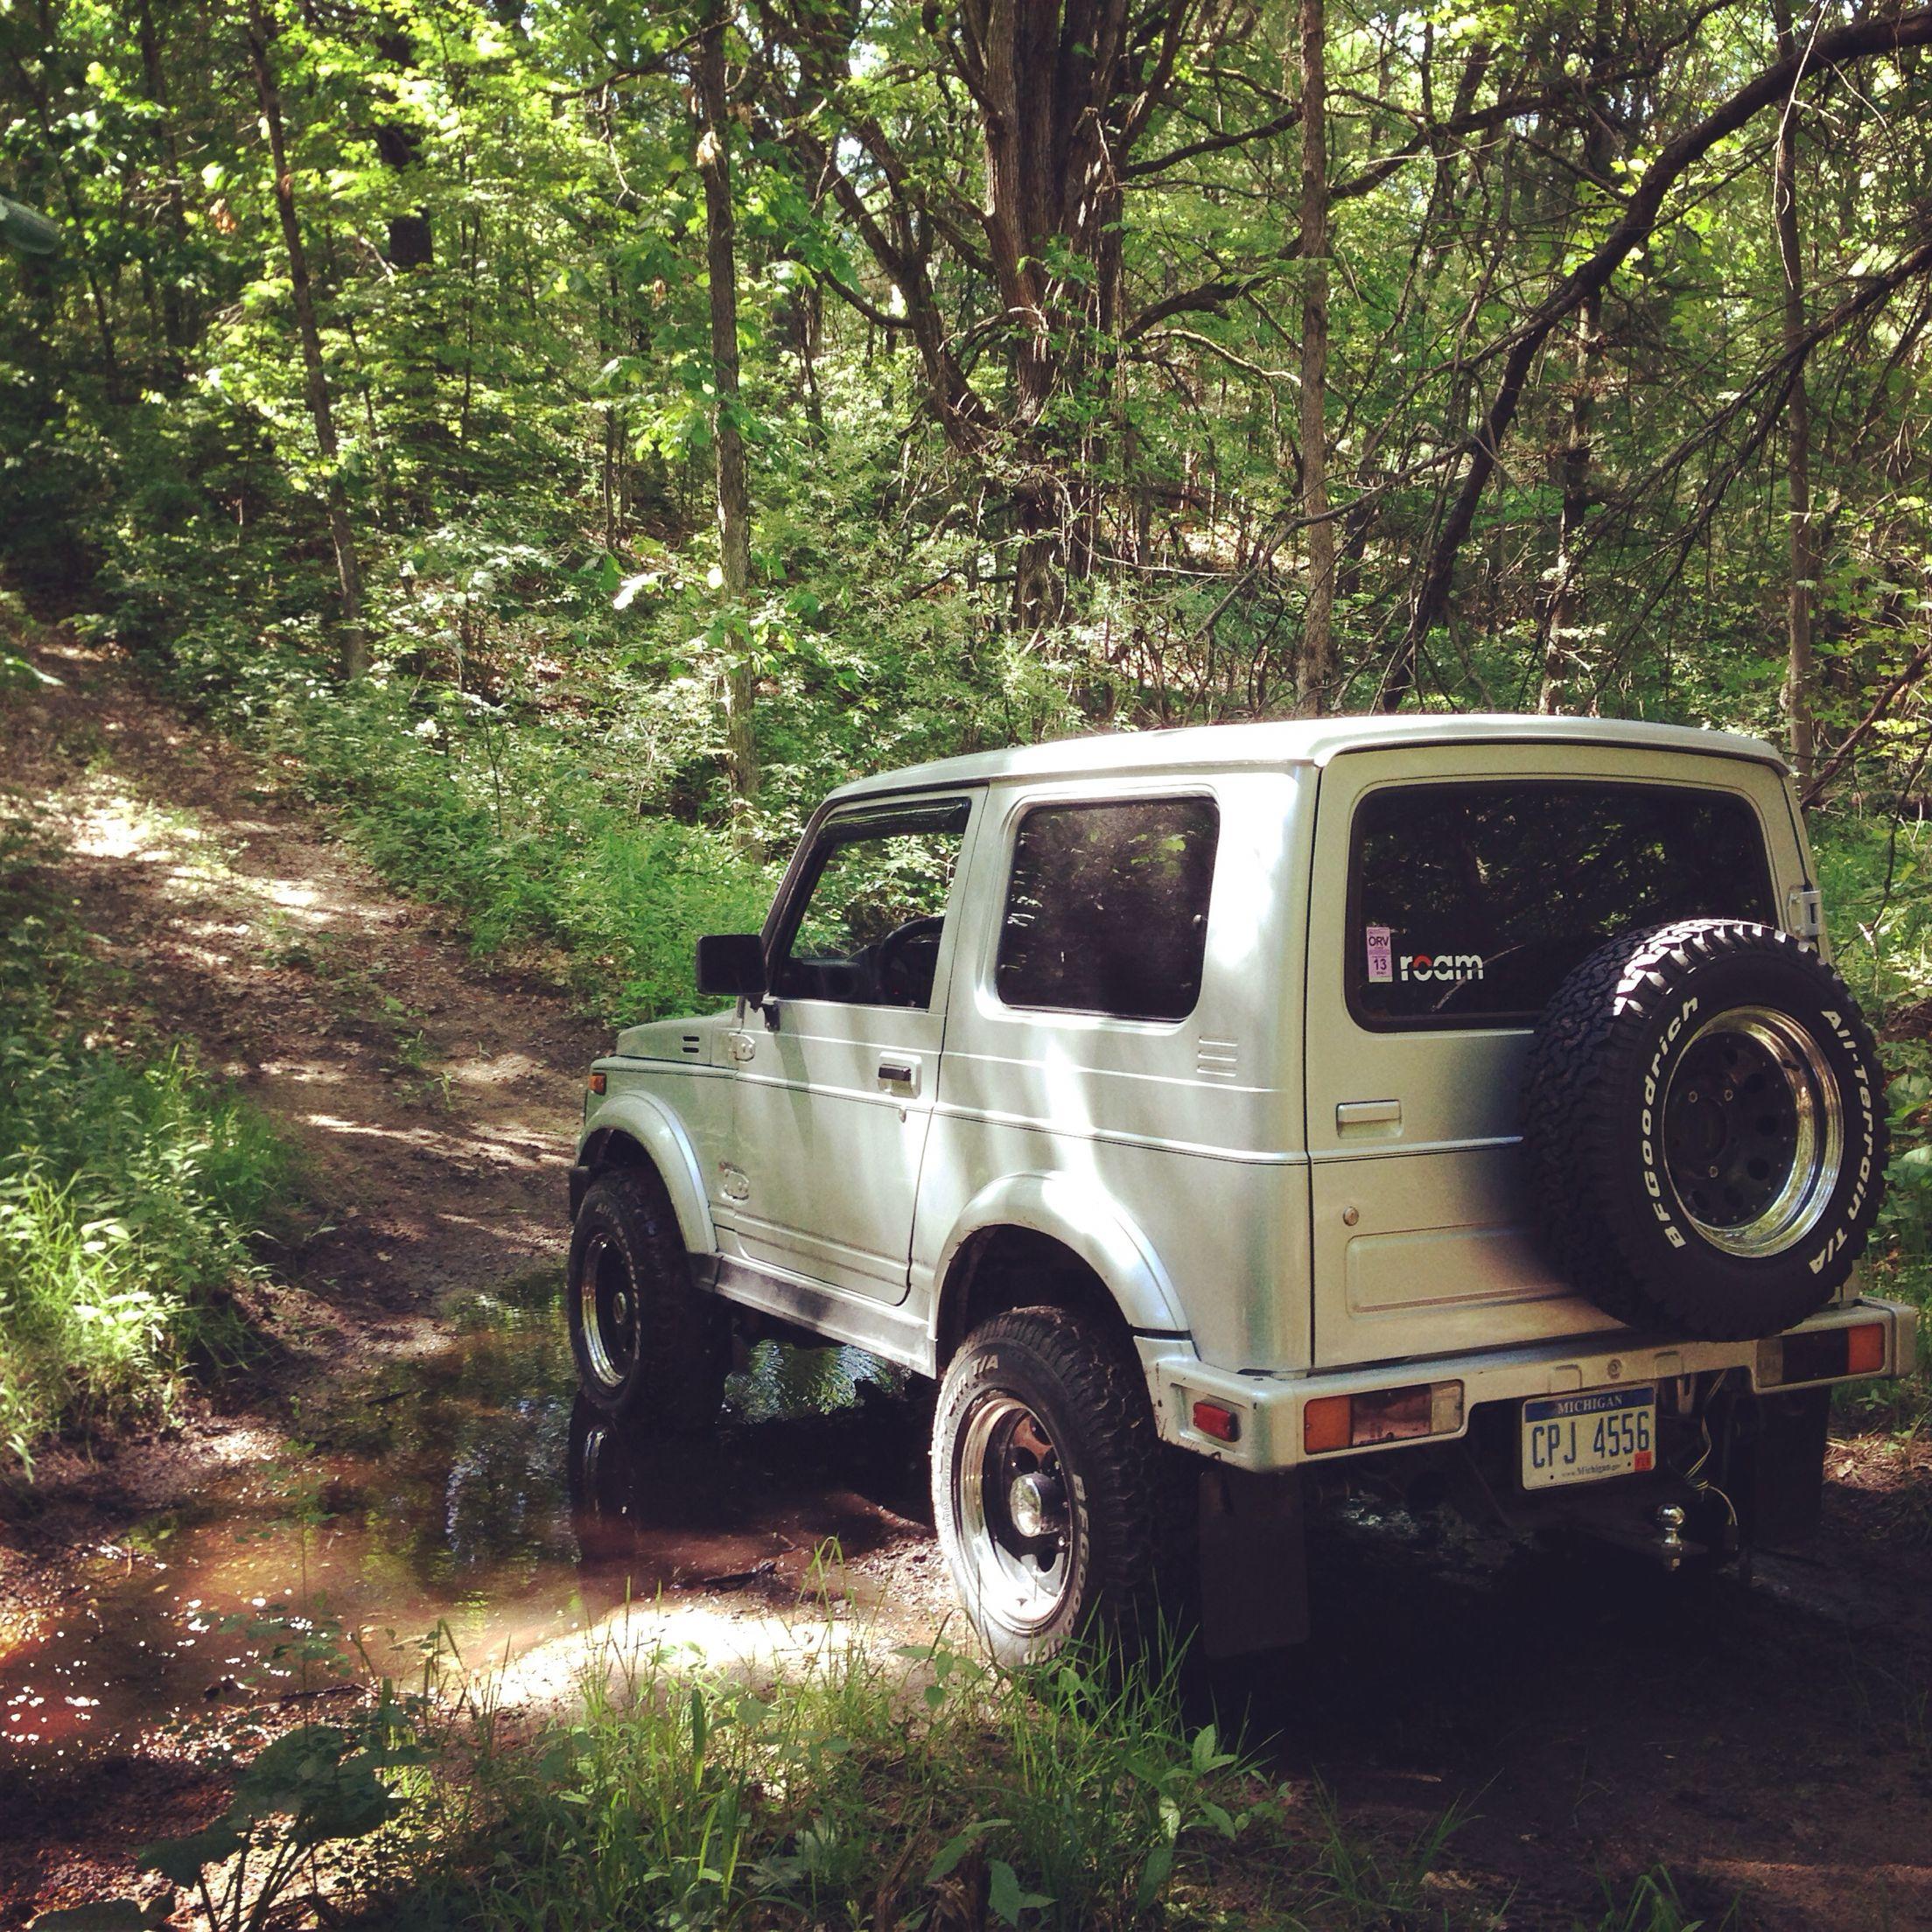 Suzuki samurai in the woods